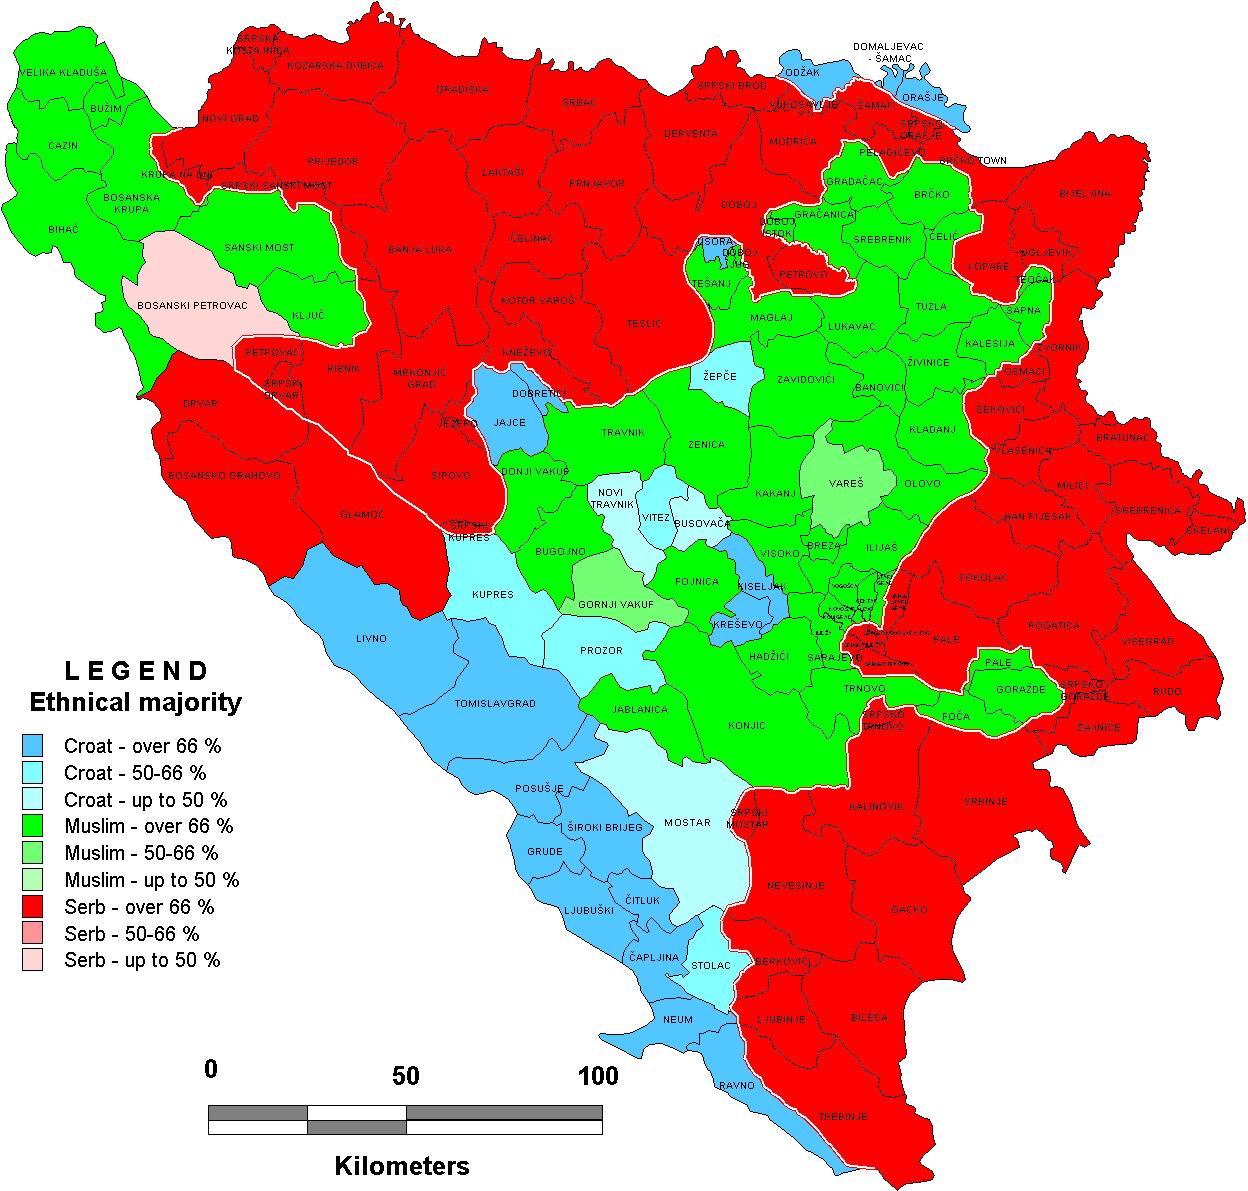 27 Years since the Massacre of Serbian Civilians in Bosnia